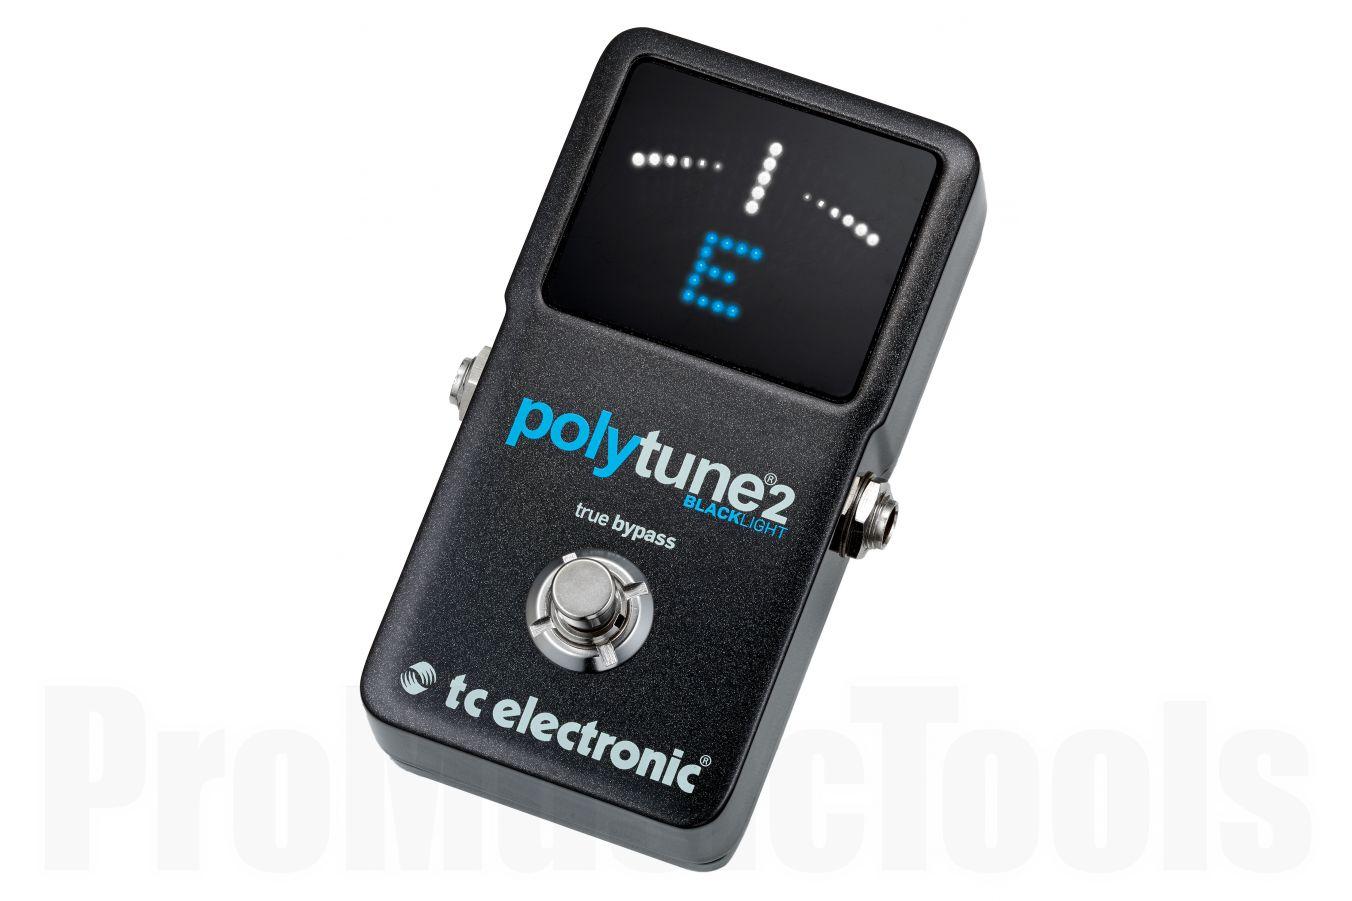 TC Electronic PolyTune 2 BlackLight - b-stock (1x opened box)